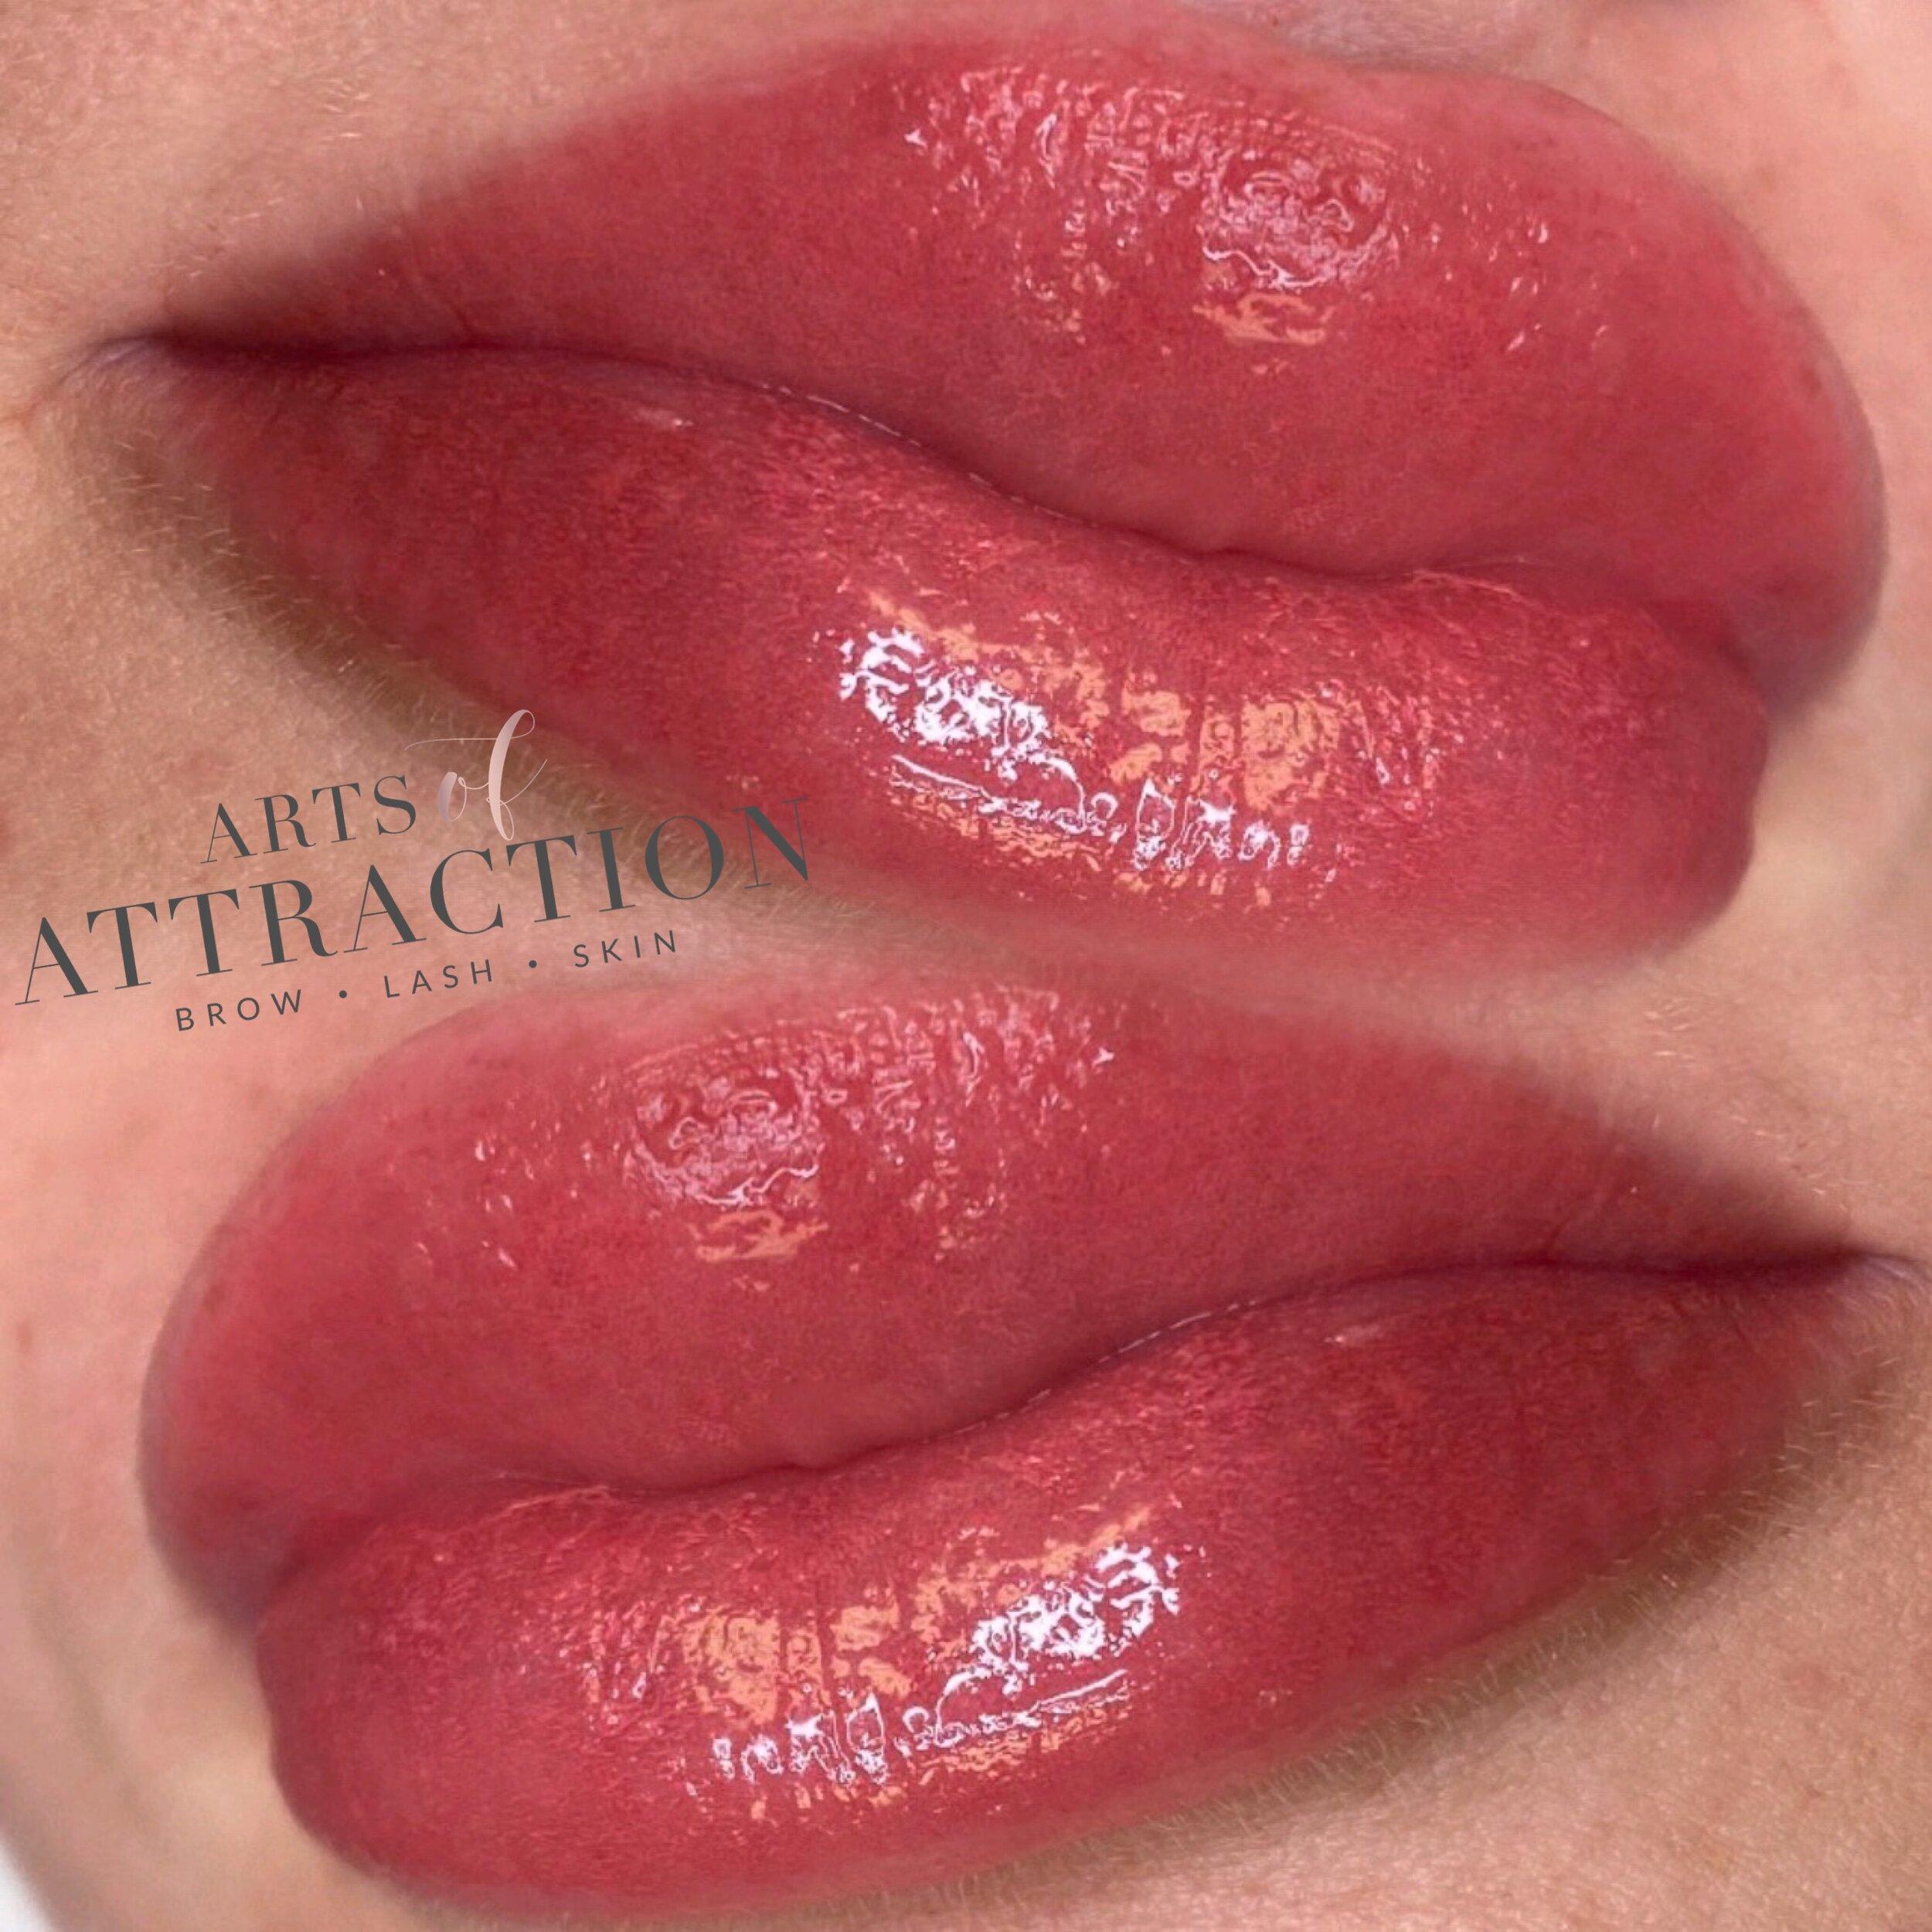 Lip Blushing vs. Lip Correction vs. Dark Lip Neutralization